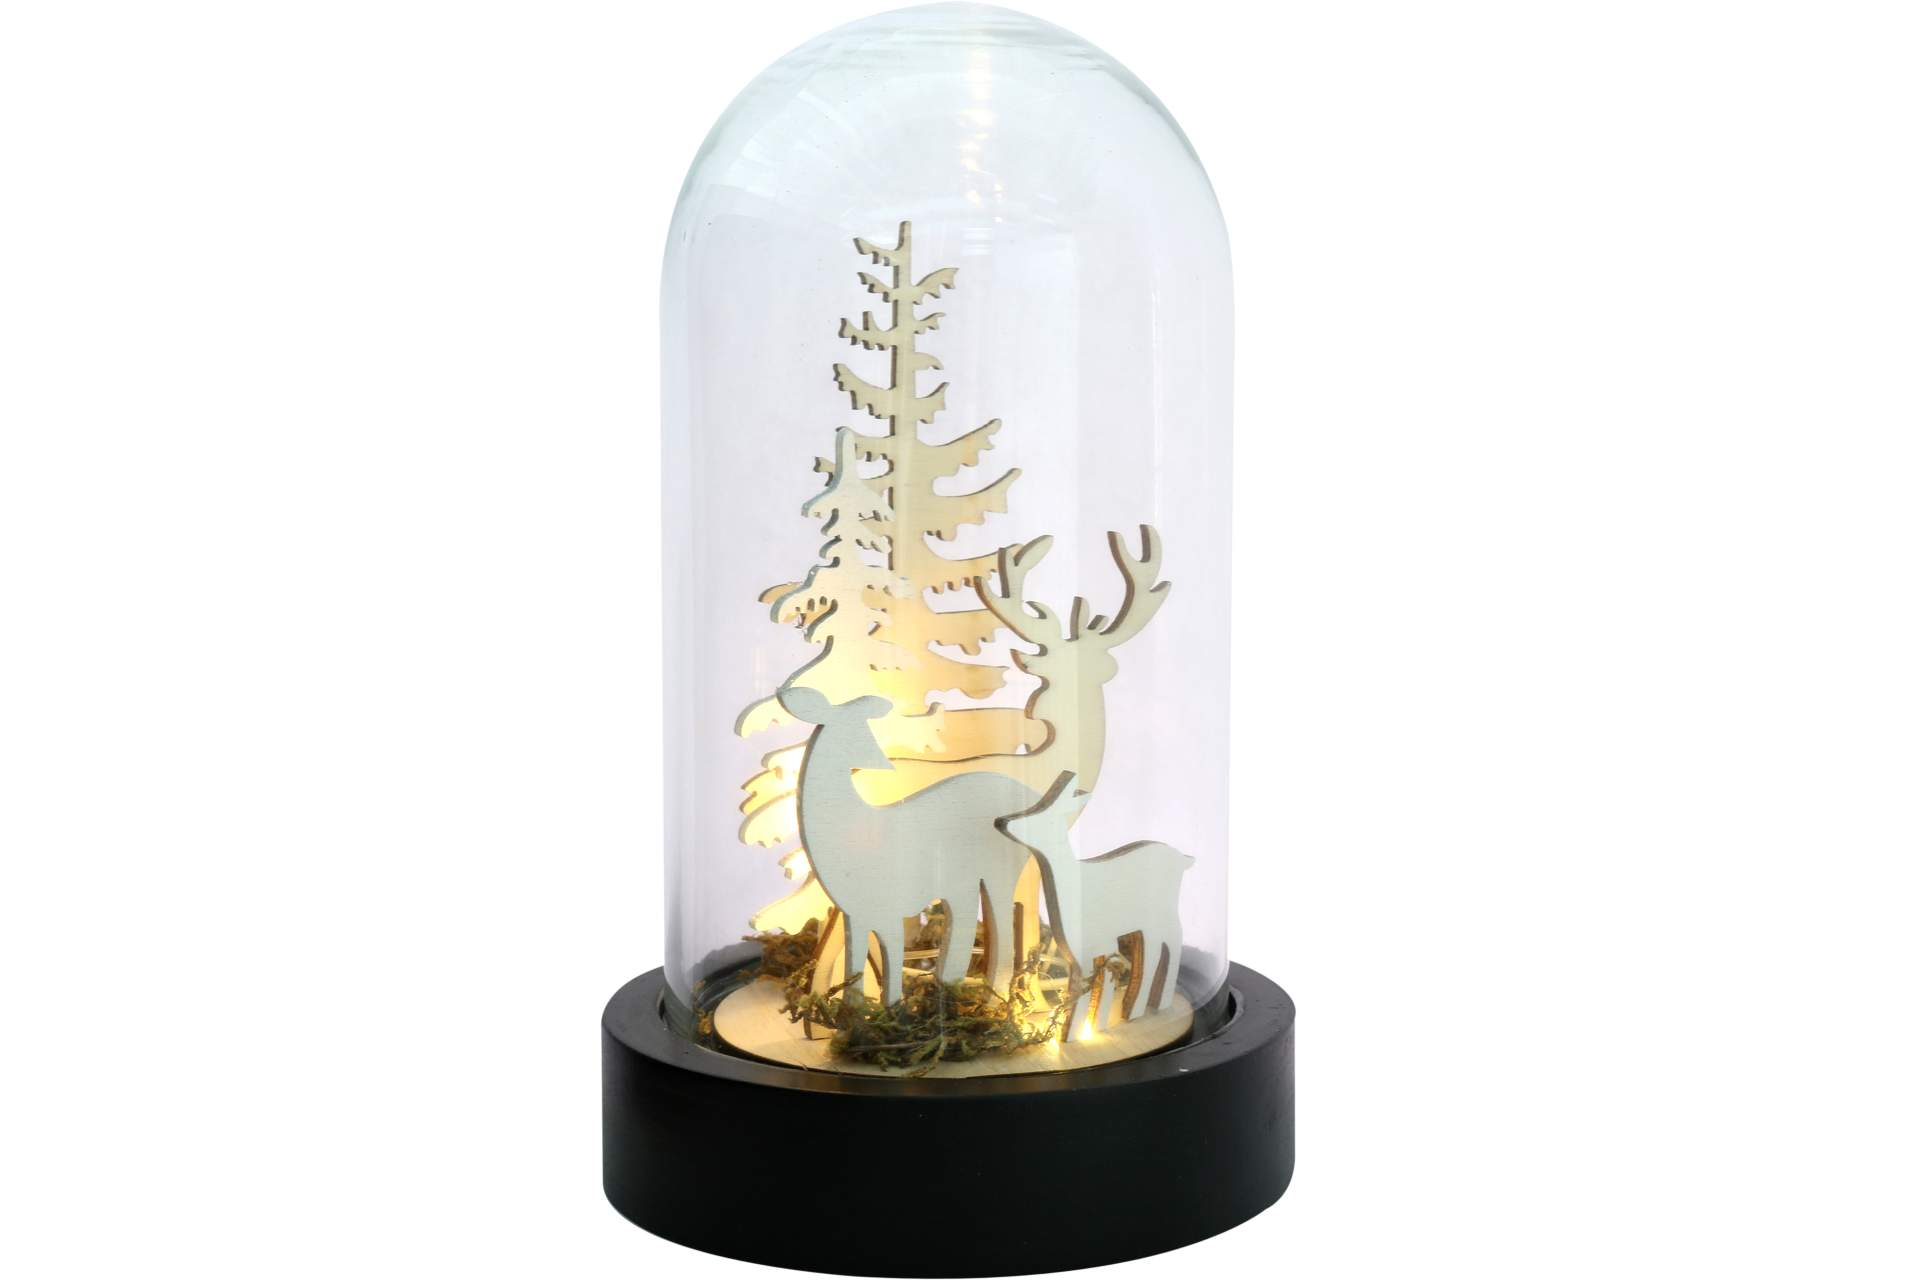 Deko led glaskuppel mit holz landschaft h 20 cm hirsch tanne dekoration dekoration posten - Led deko tanne ...